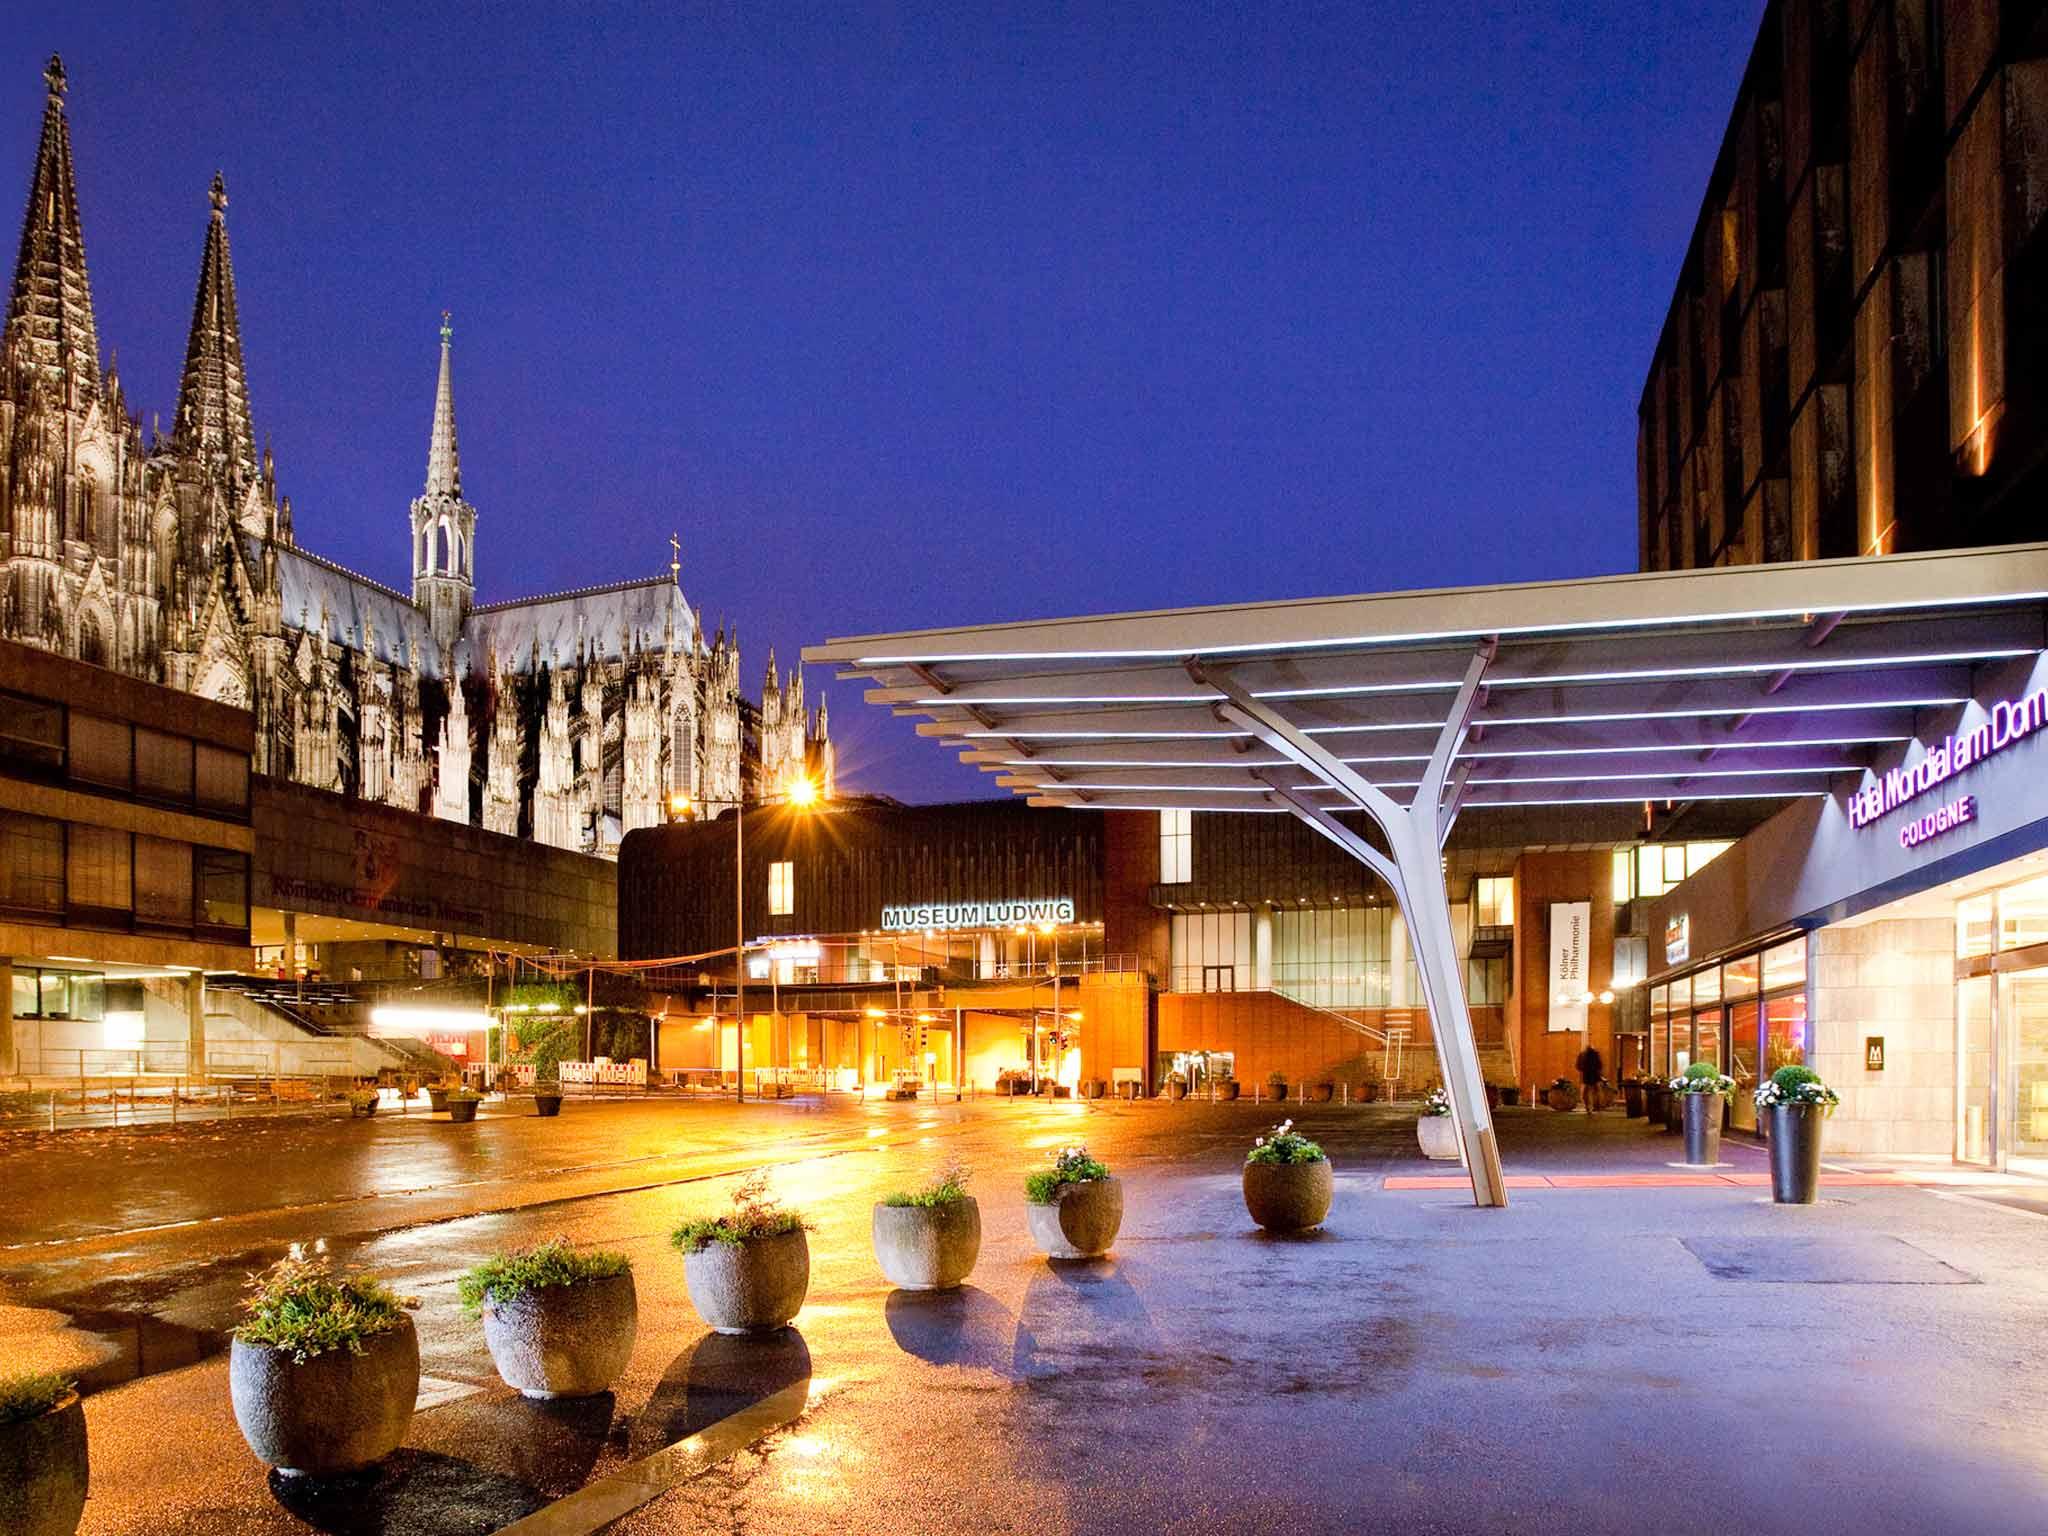 Dom Messe Köln